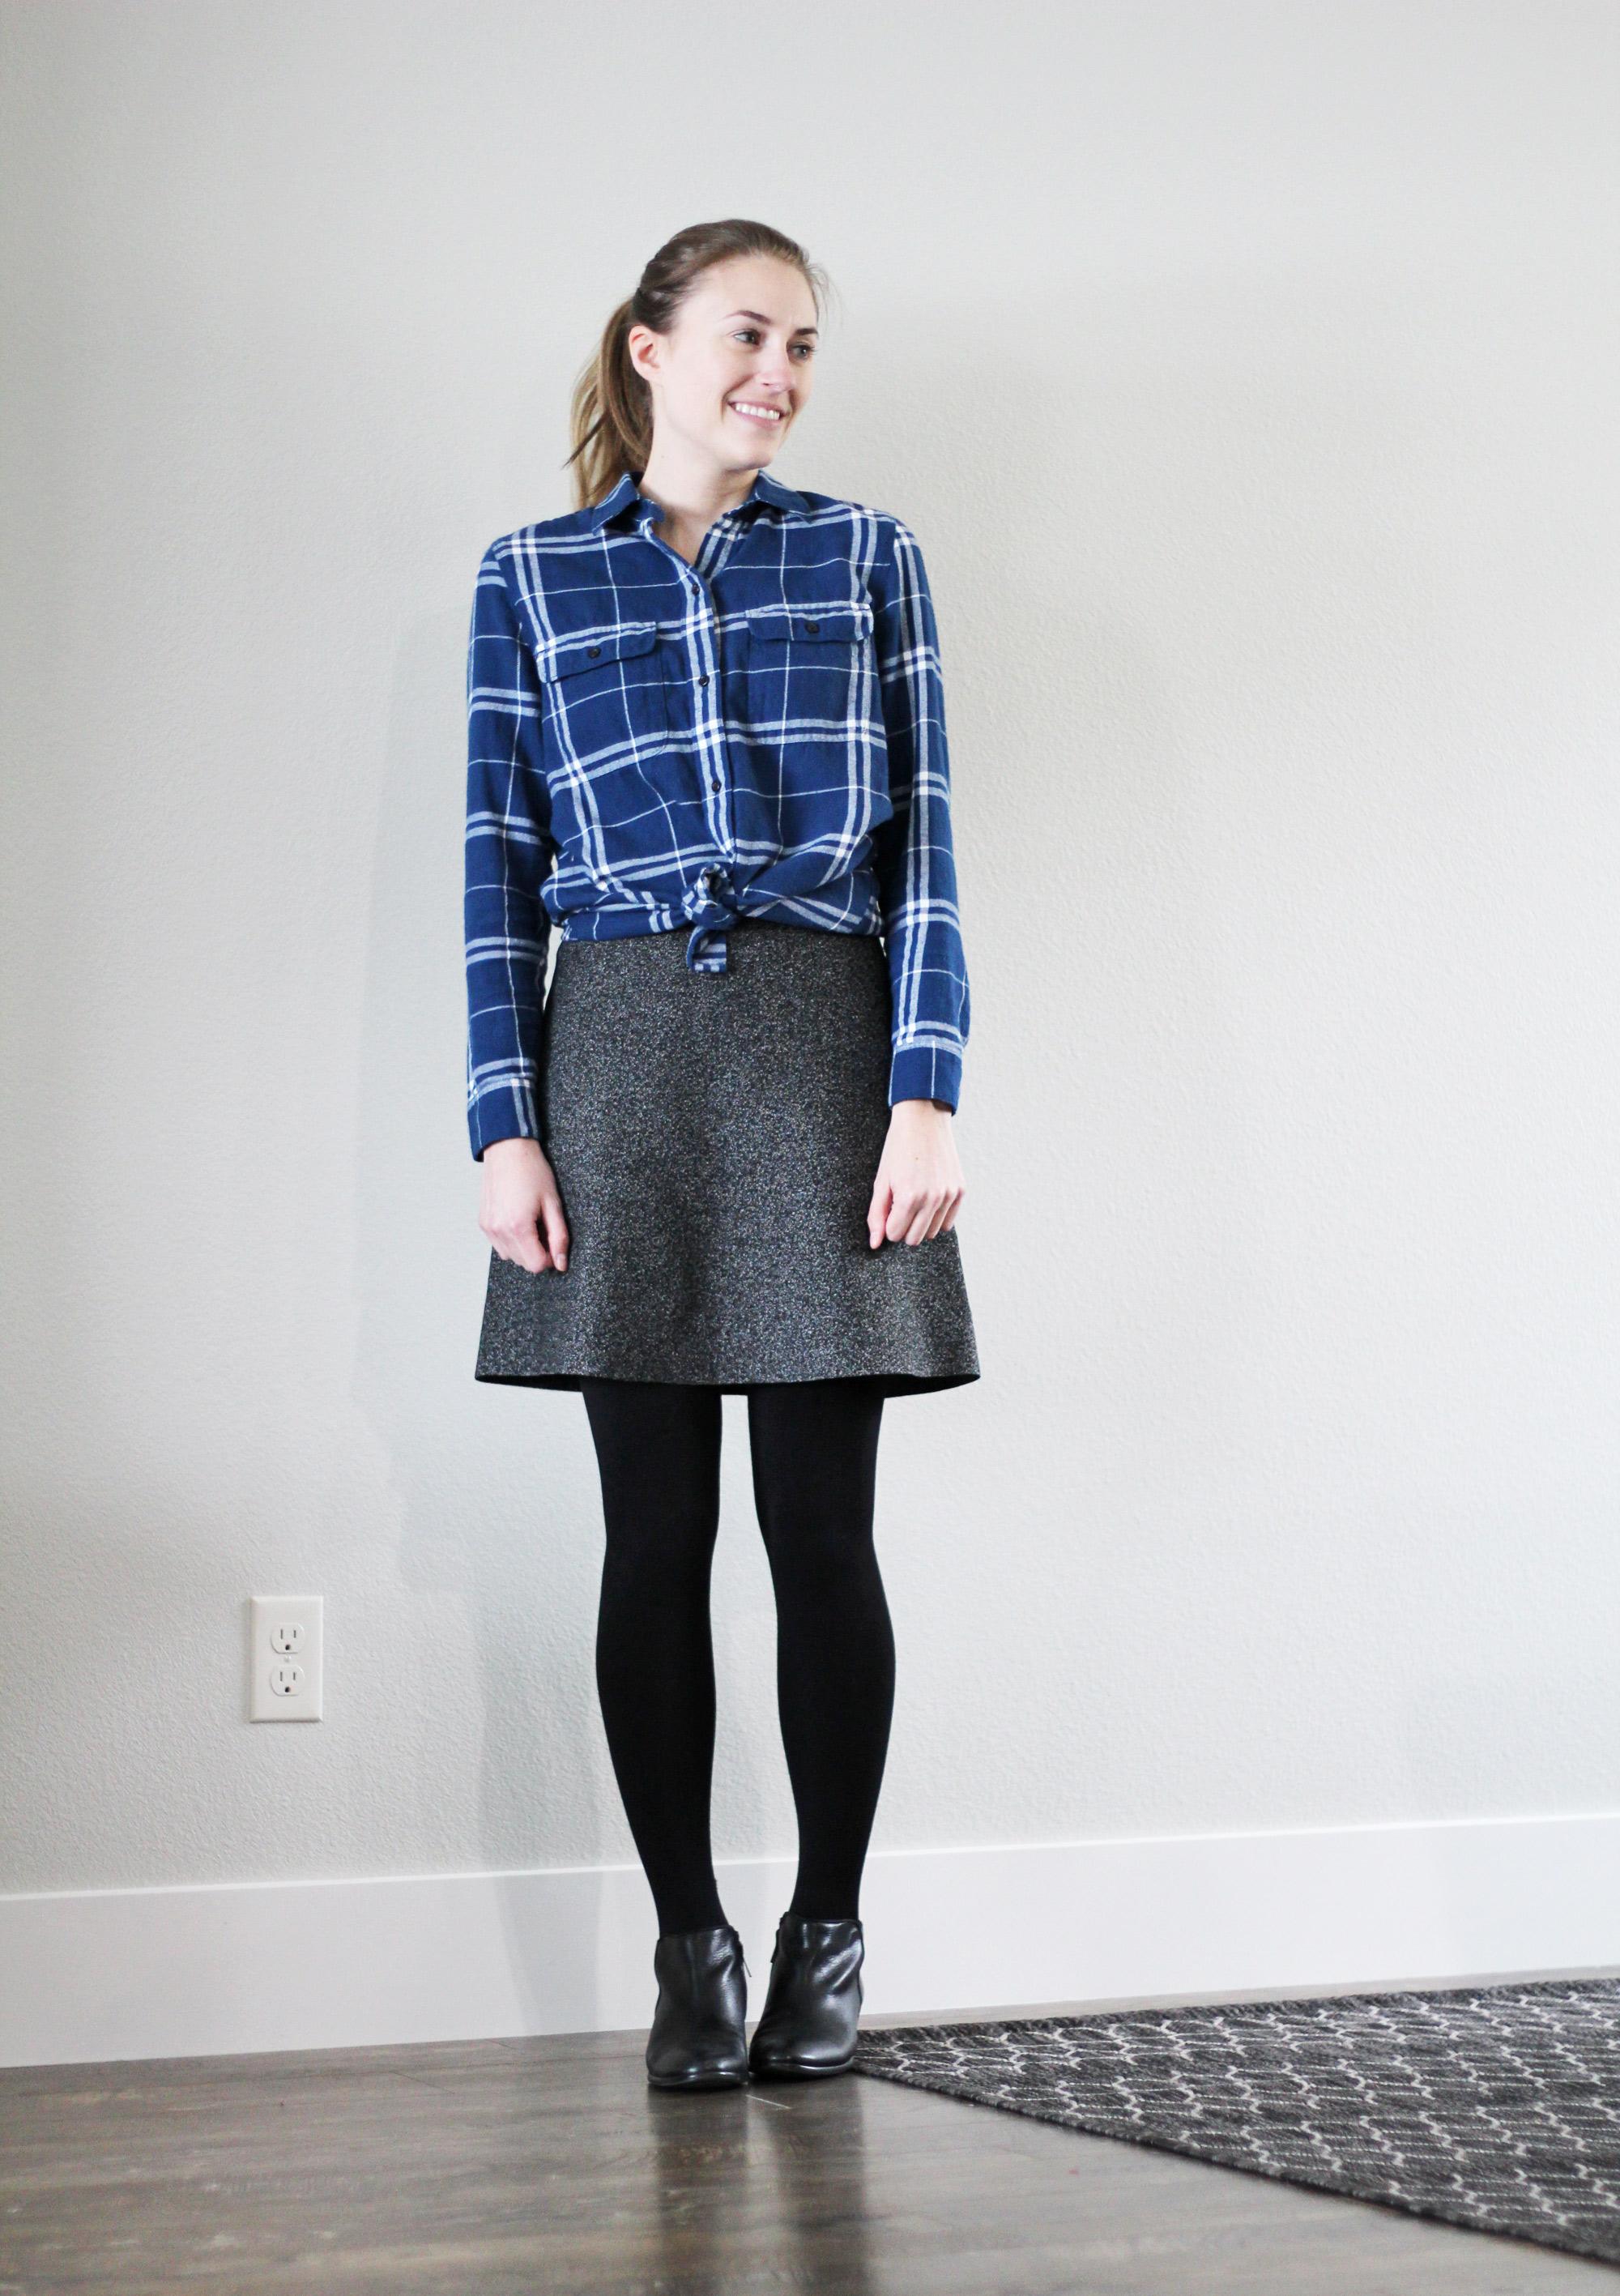 Winter 10x10: Blue plaid flannel shirt, speckled skirt, black ankle boots — Cotton Cashmere Cat Hair